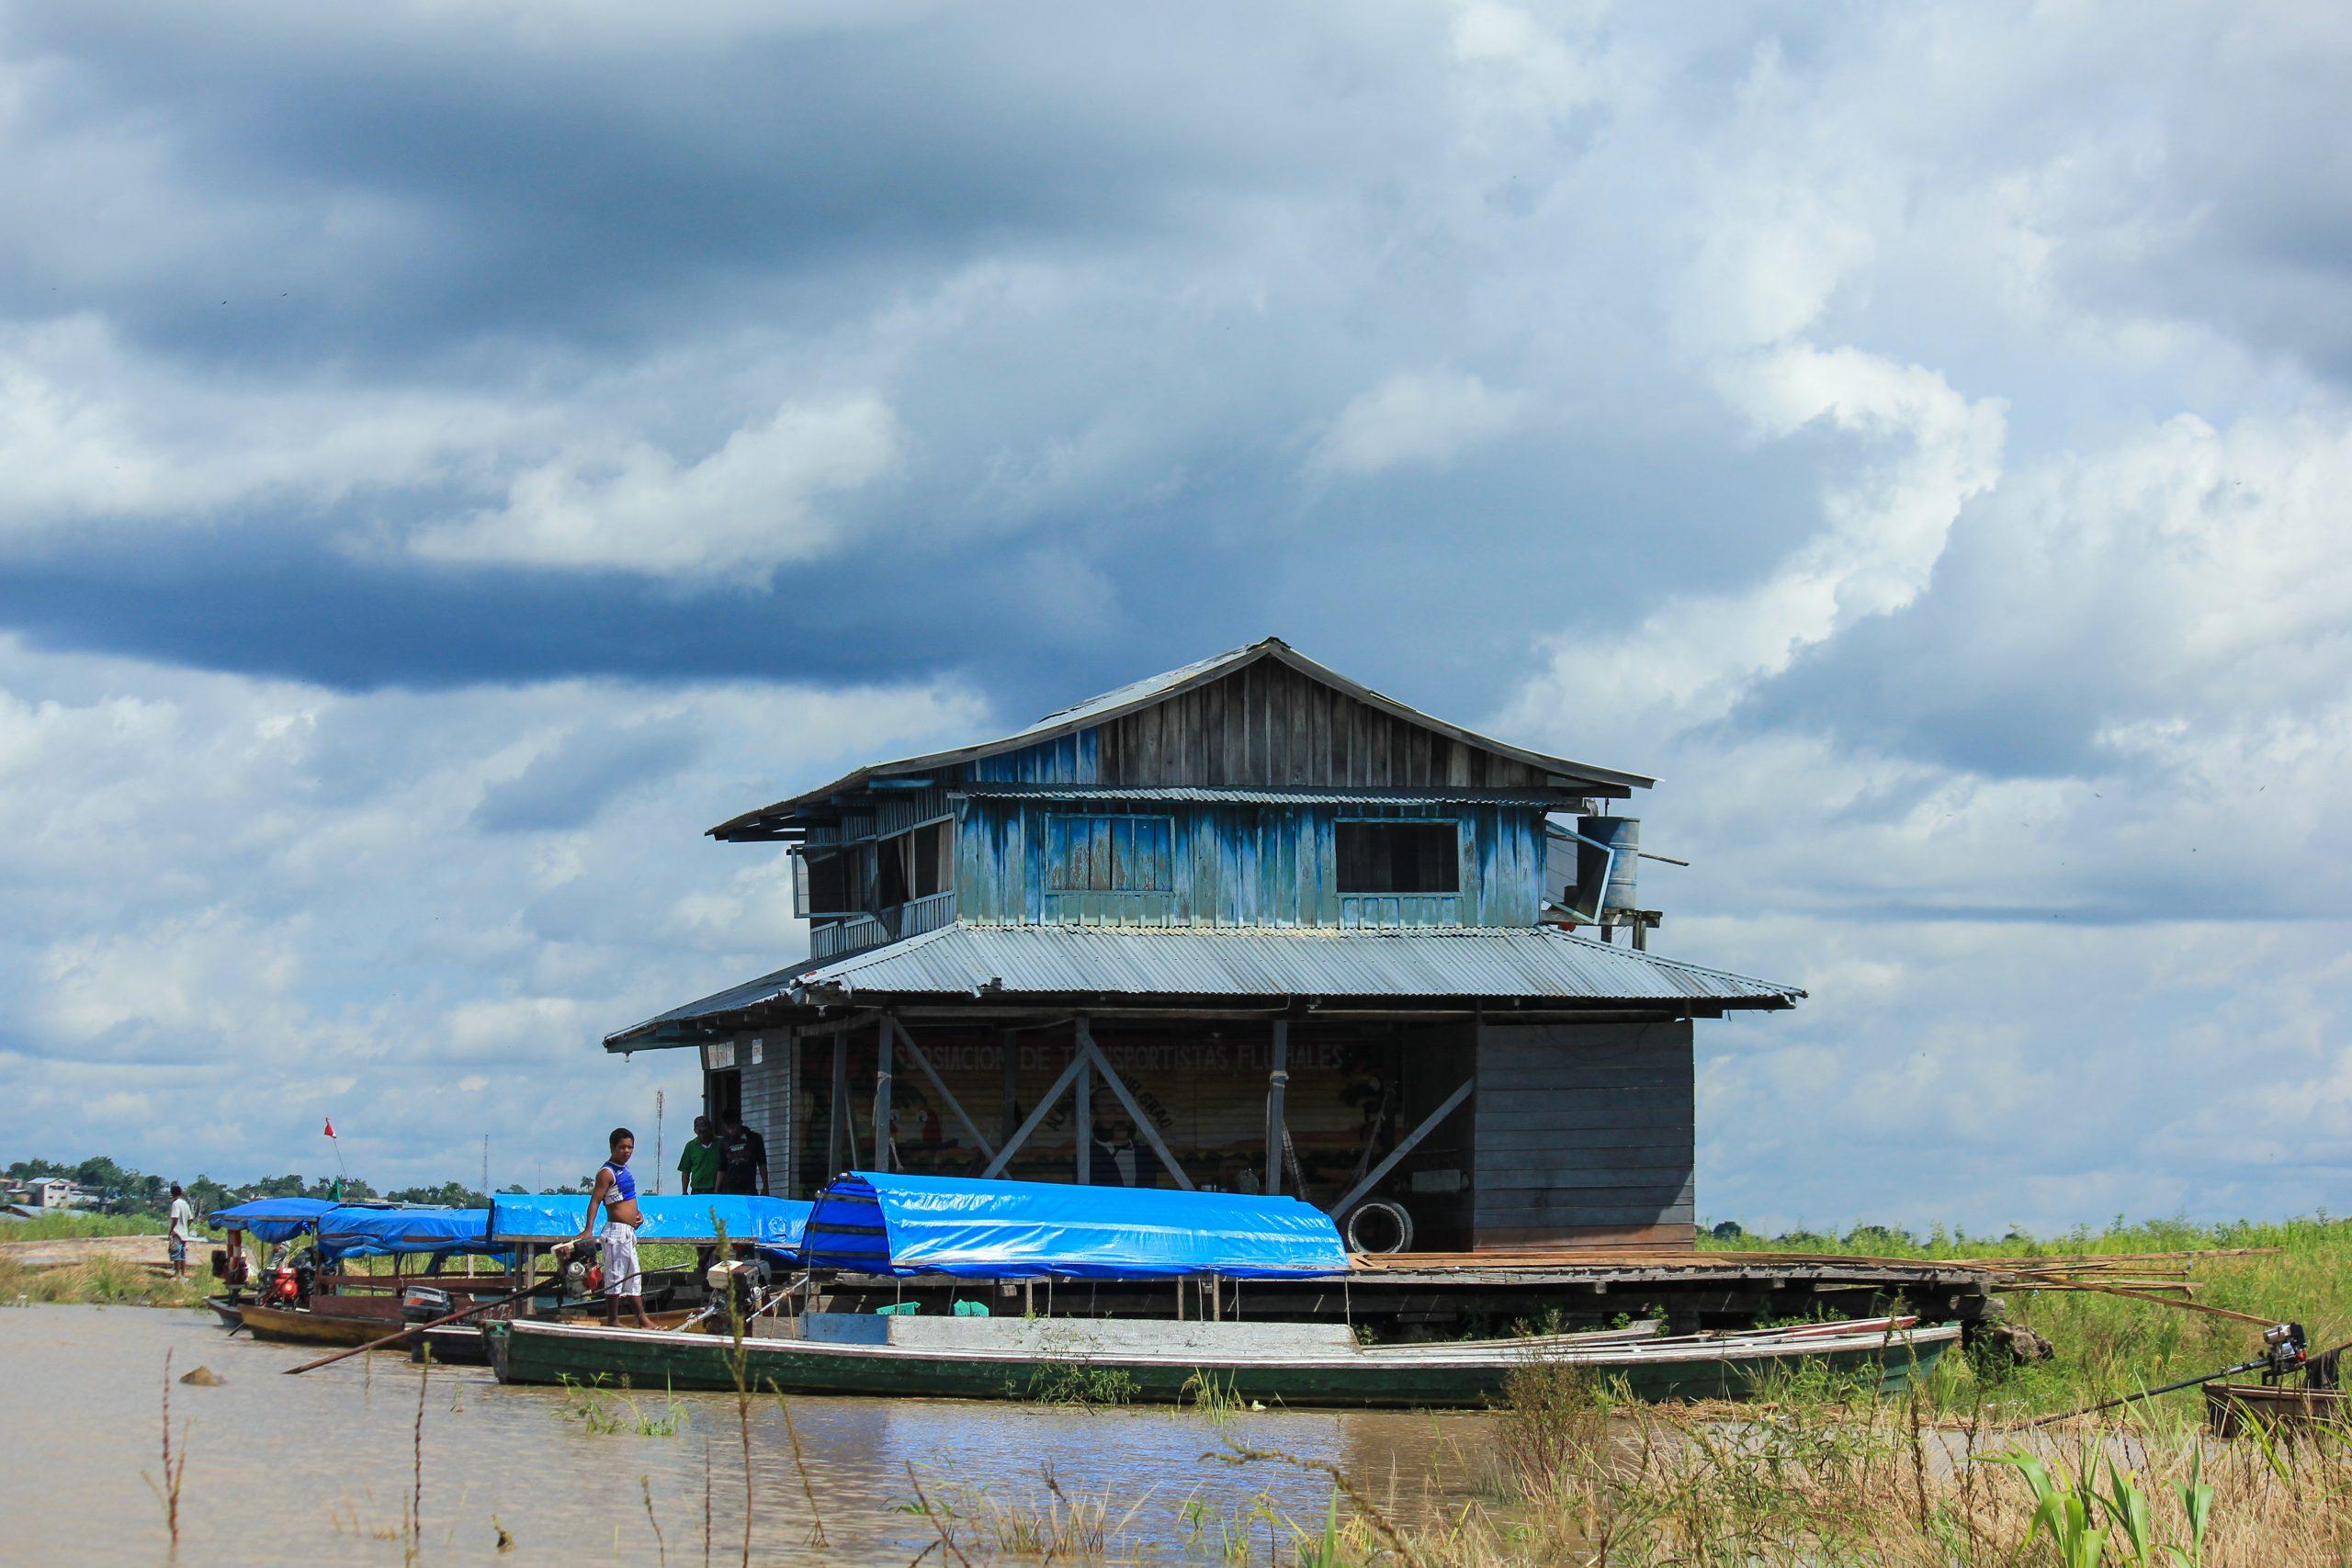 Santa Rosa, Amazon River, Peru, South America